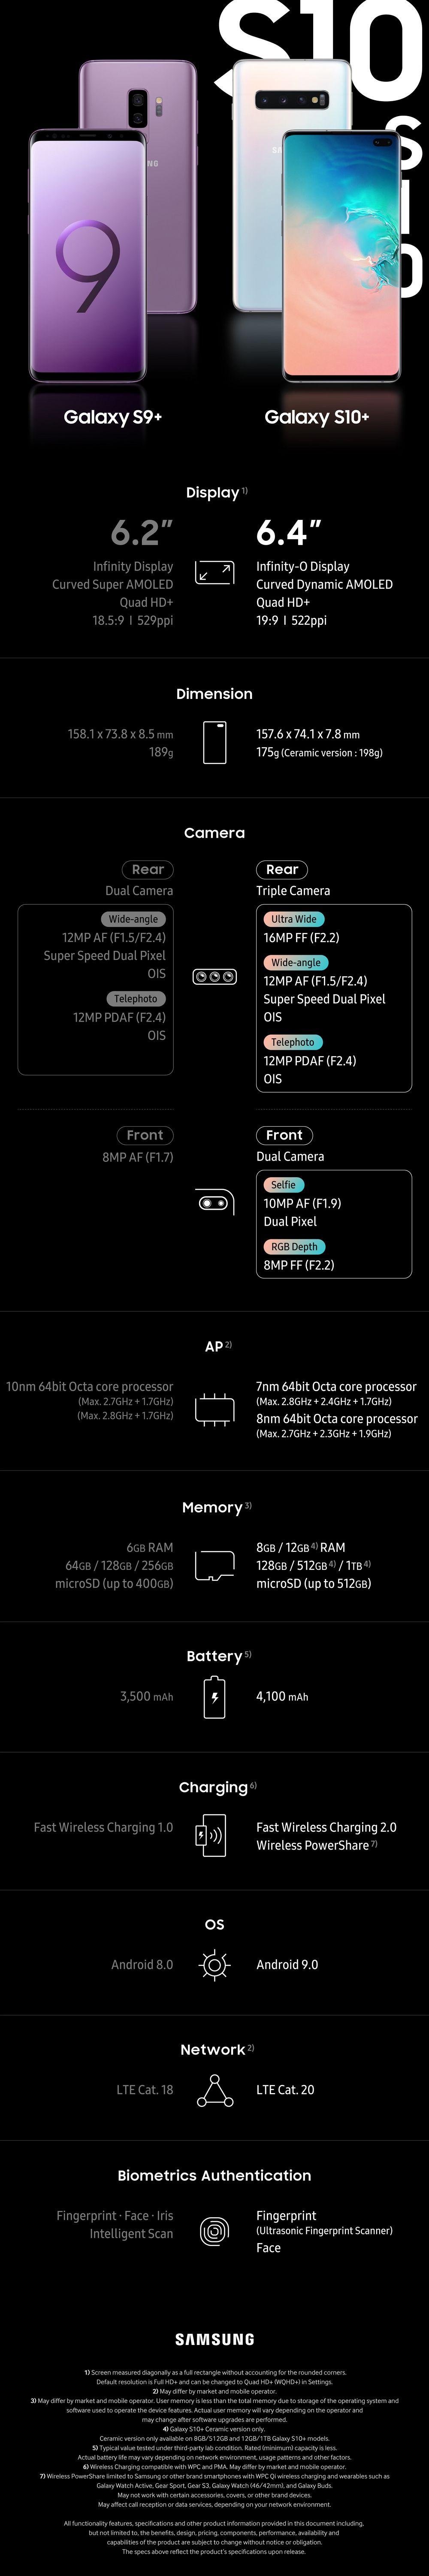 Comparativa: Samsung Galaxy S10+ vs Samsung Galaxy S9+